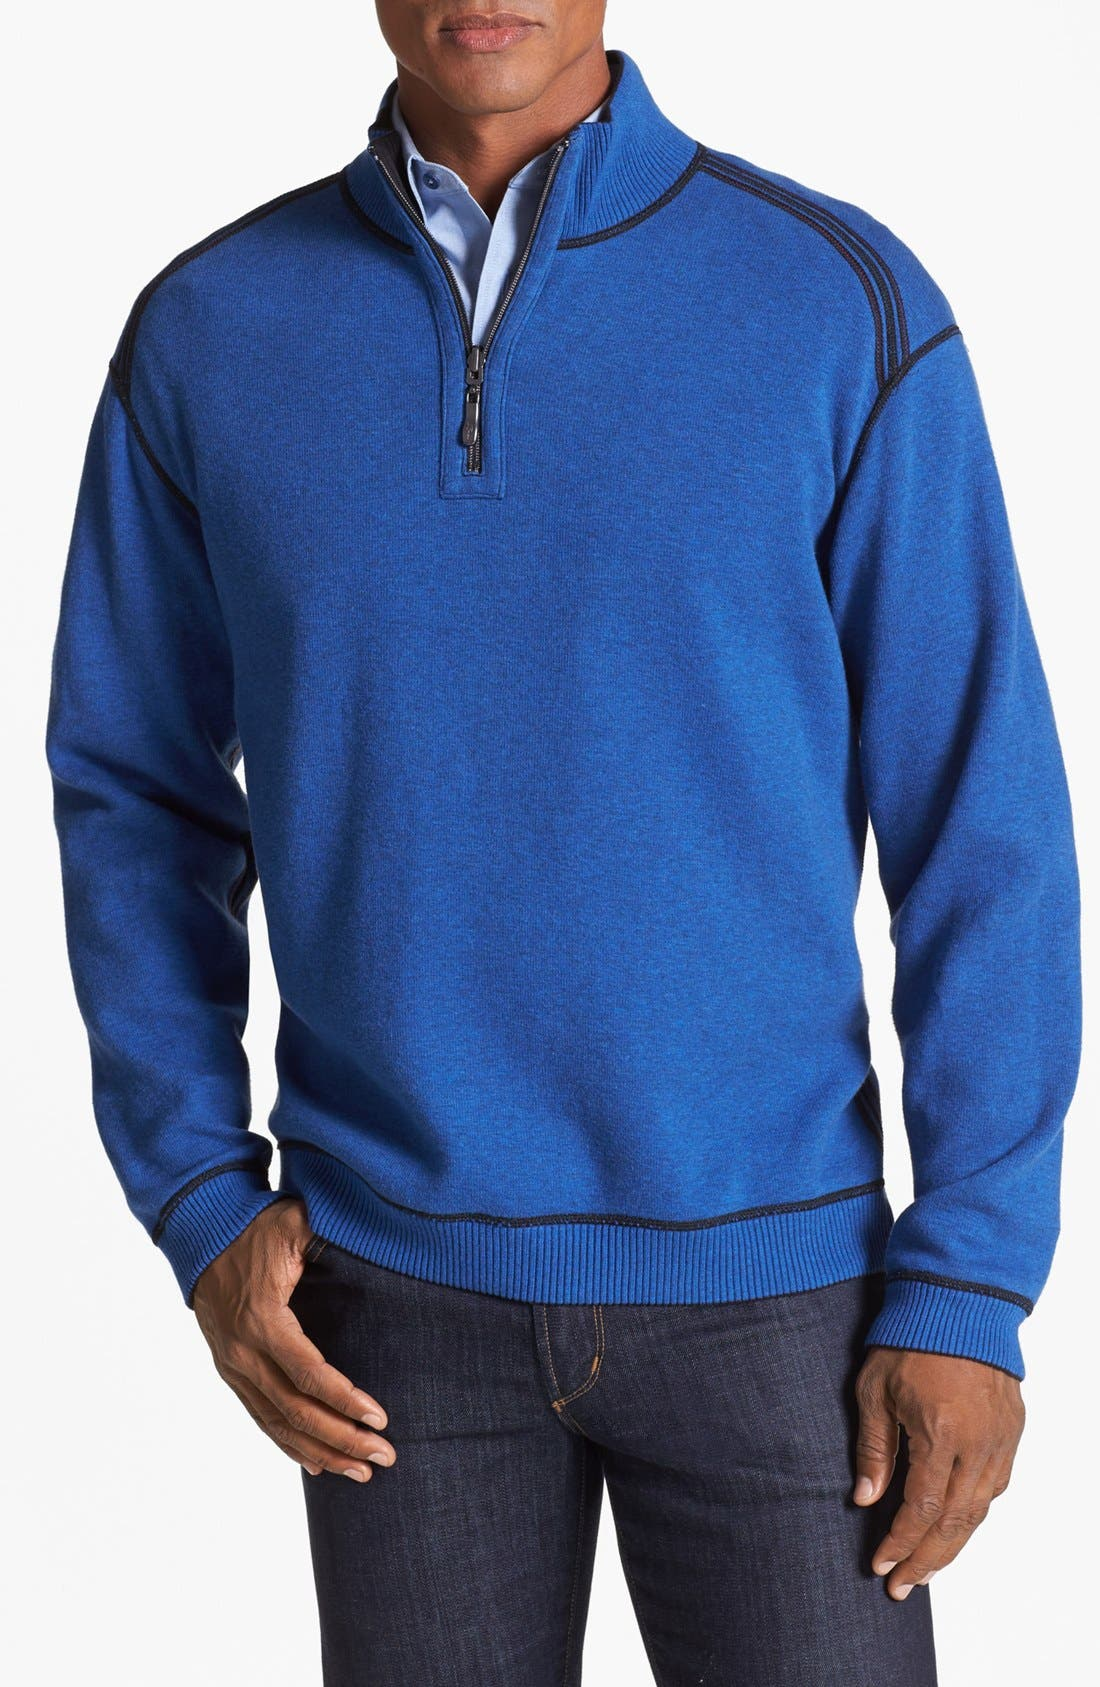 Alternate Image 2  - Tommy Bahama 'Flip Side Pro' Half Zip Pullover (Big & Tall)